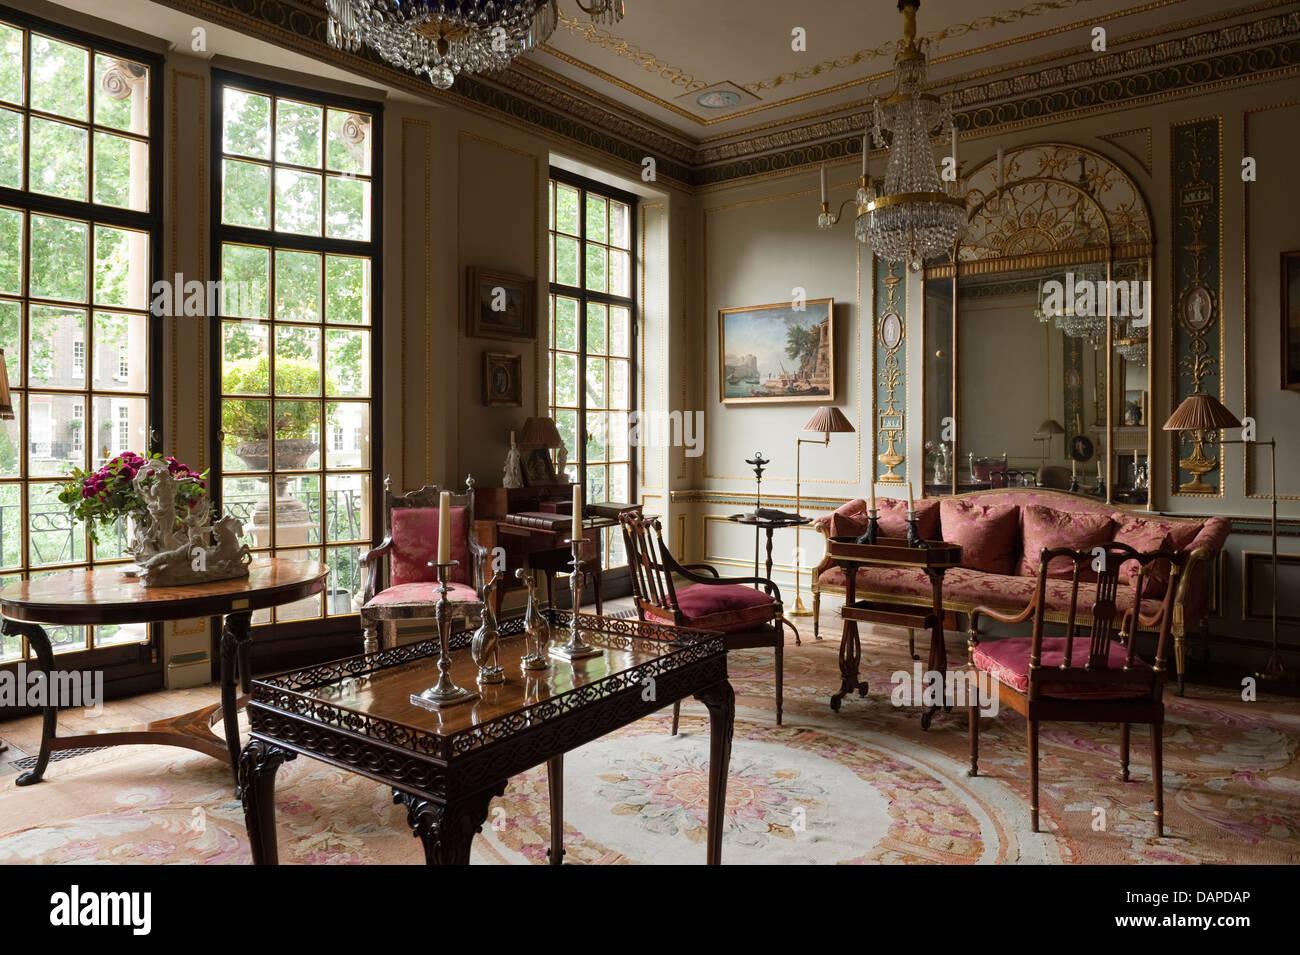 Best Design Aus Glas Rezeption Bilder Pictures - House Design Ideas ...